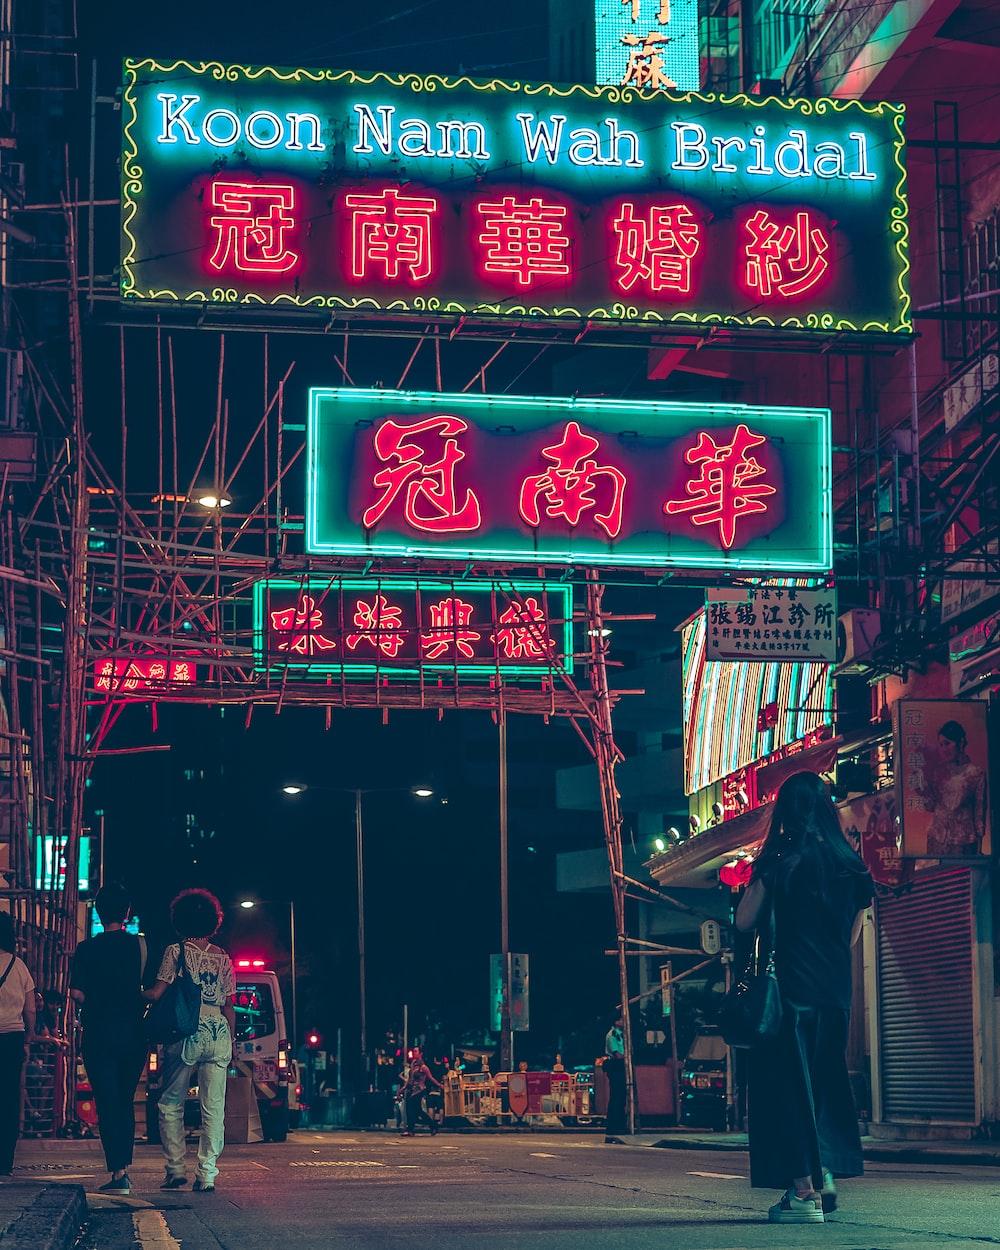 lighted Koon Nam Wah Bridal signage